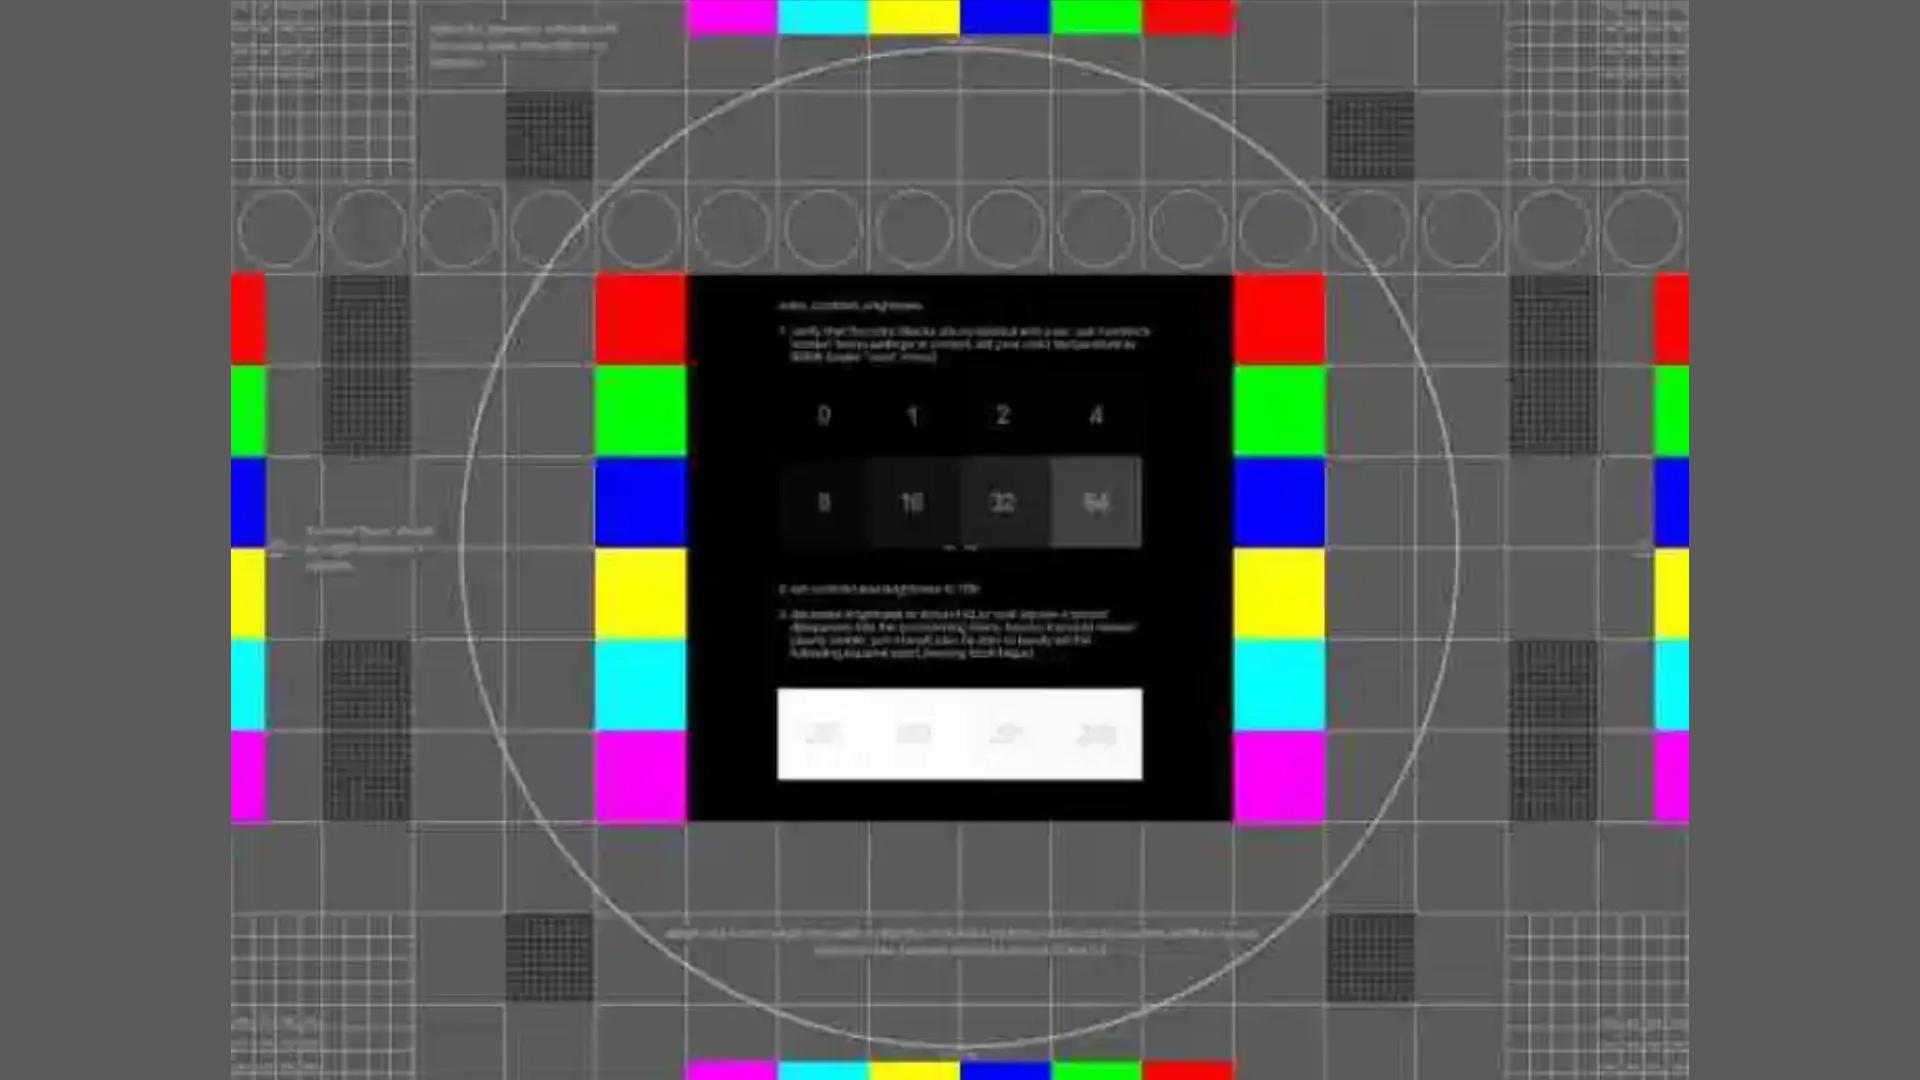 Calibrando Monitor no Windows 10